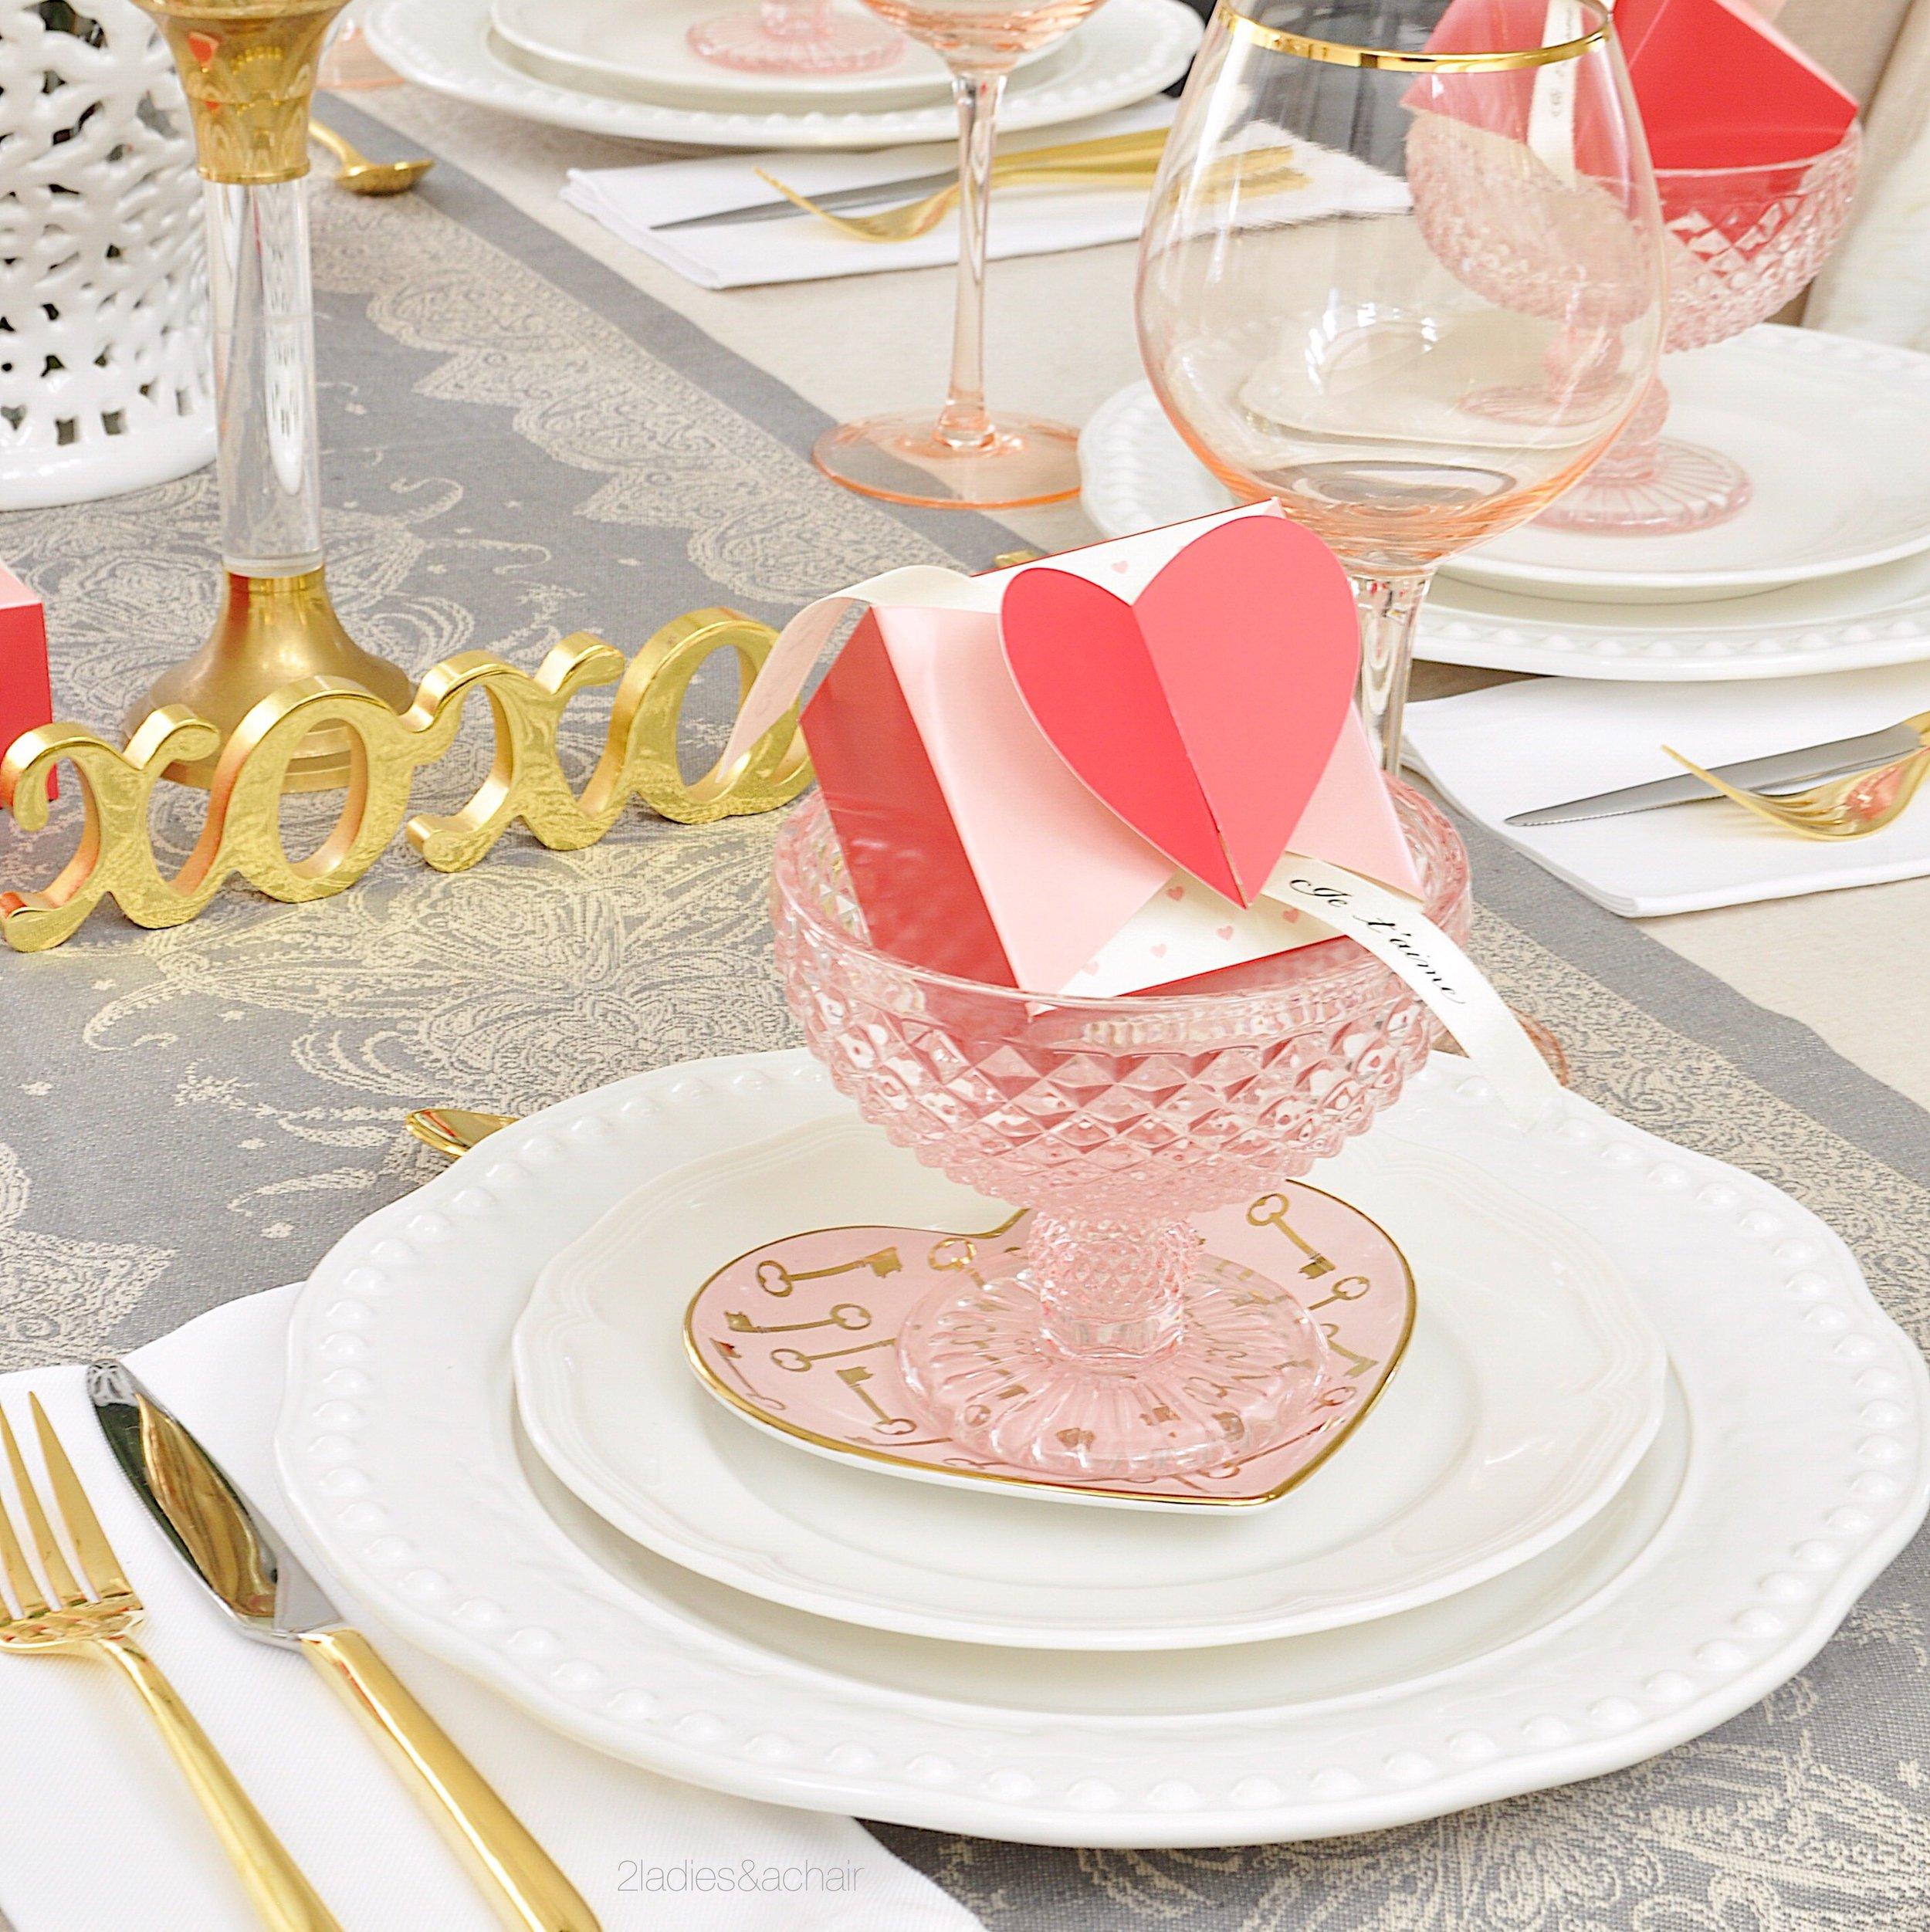 valentines day table decor IMG_0345.JPG